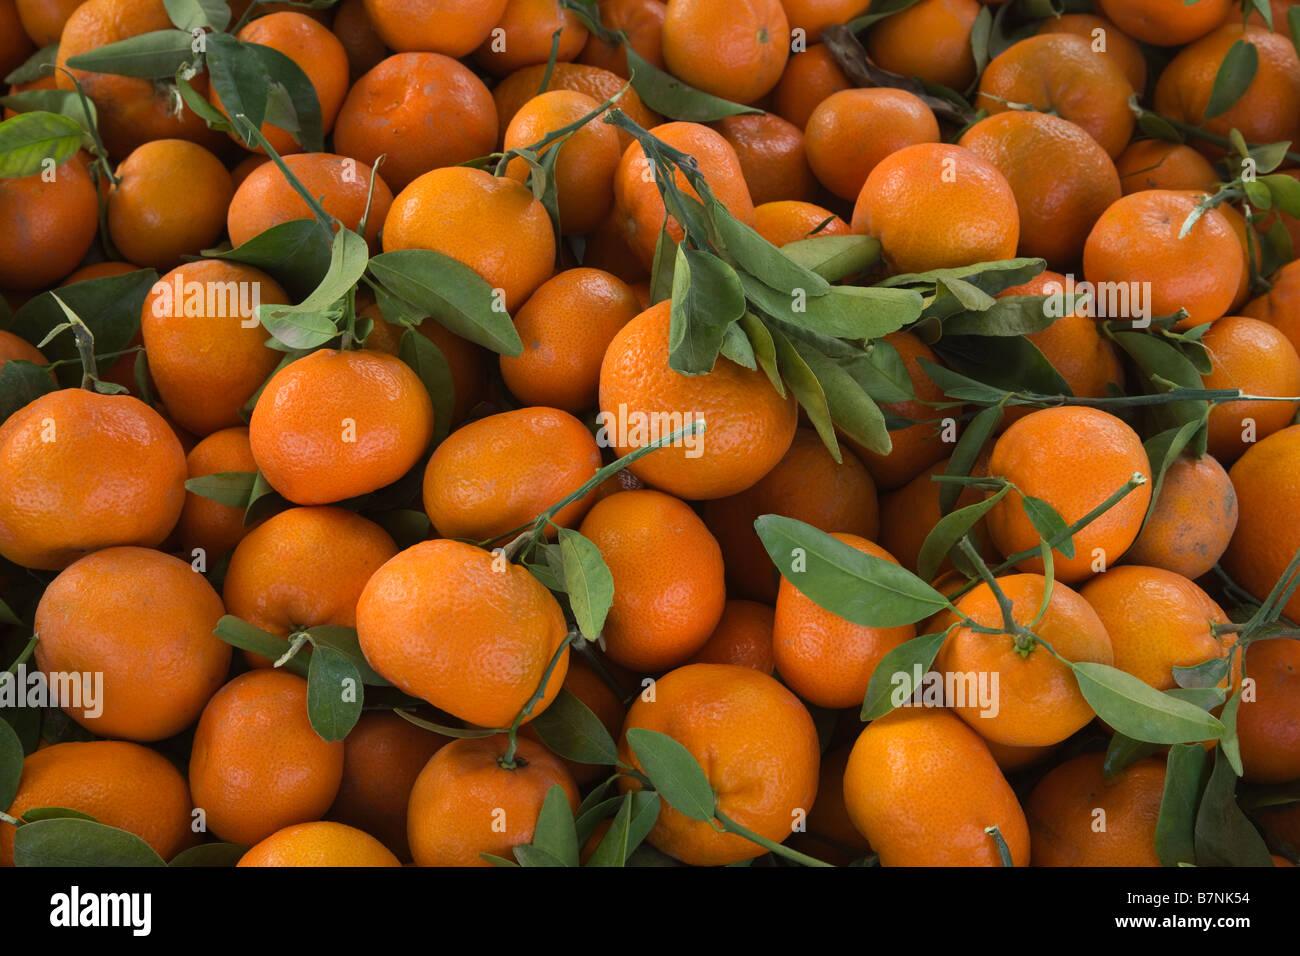 Harvested Mandarins 'Murcott' variety. - Stock Image